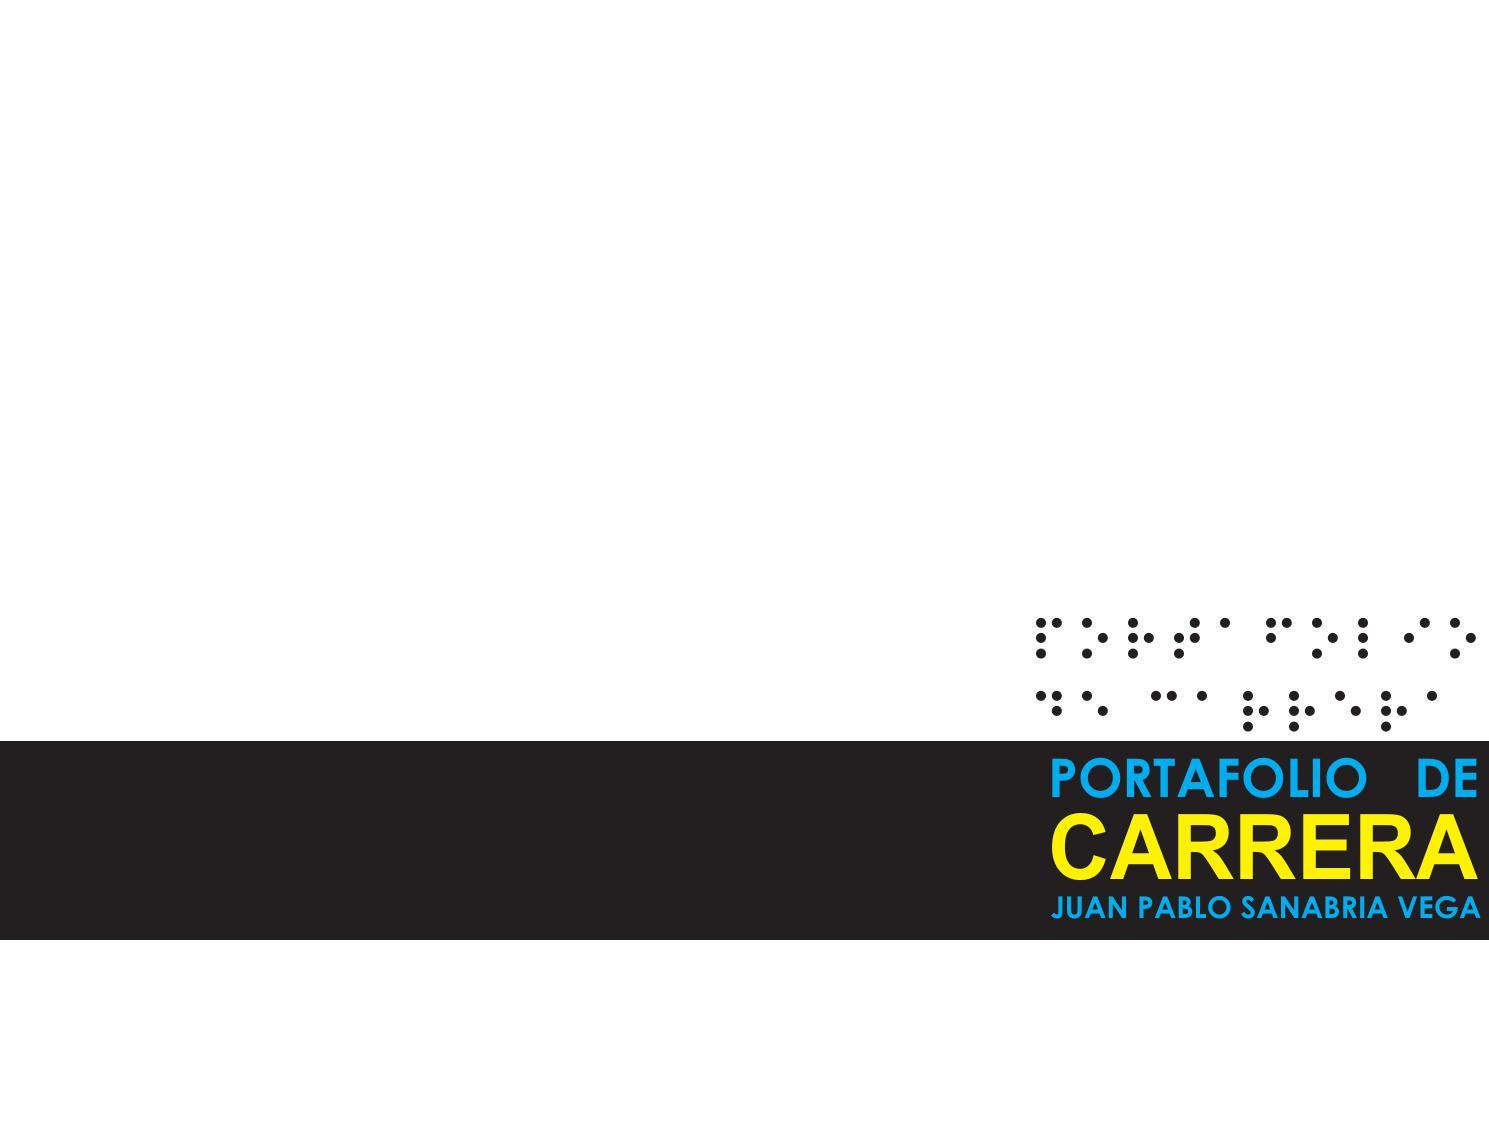 Portafolio de Carrera by juan pablo sanabria - issuu